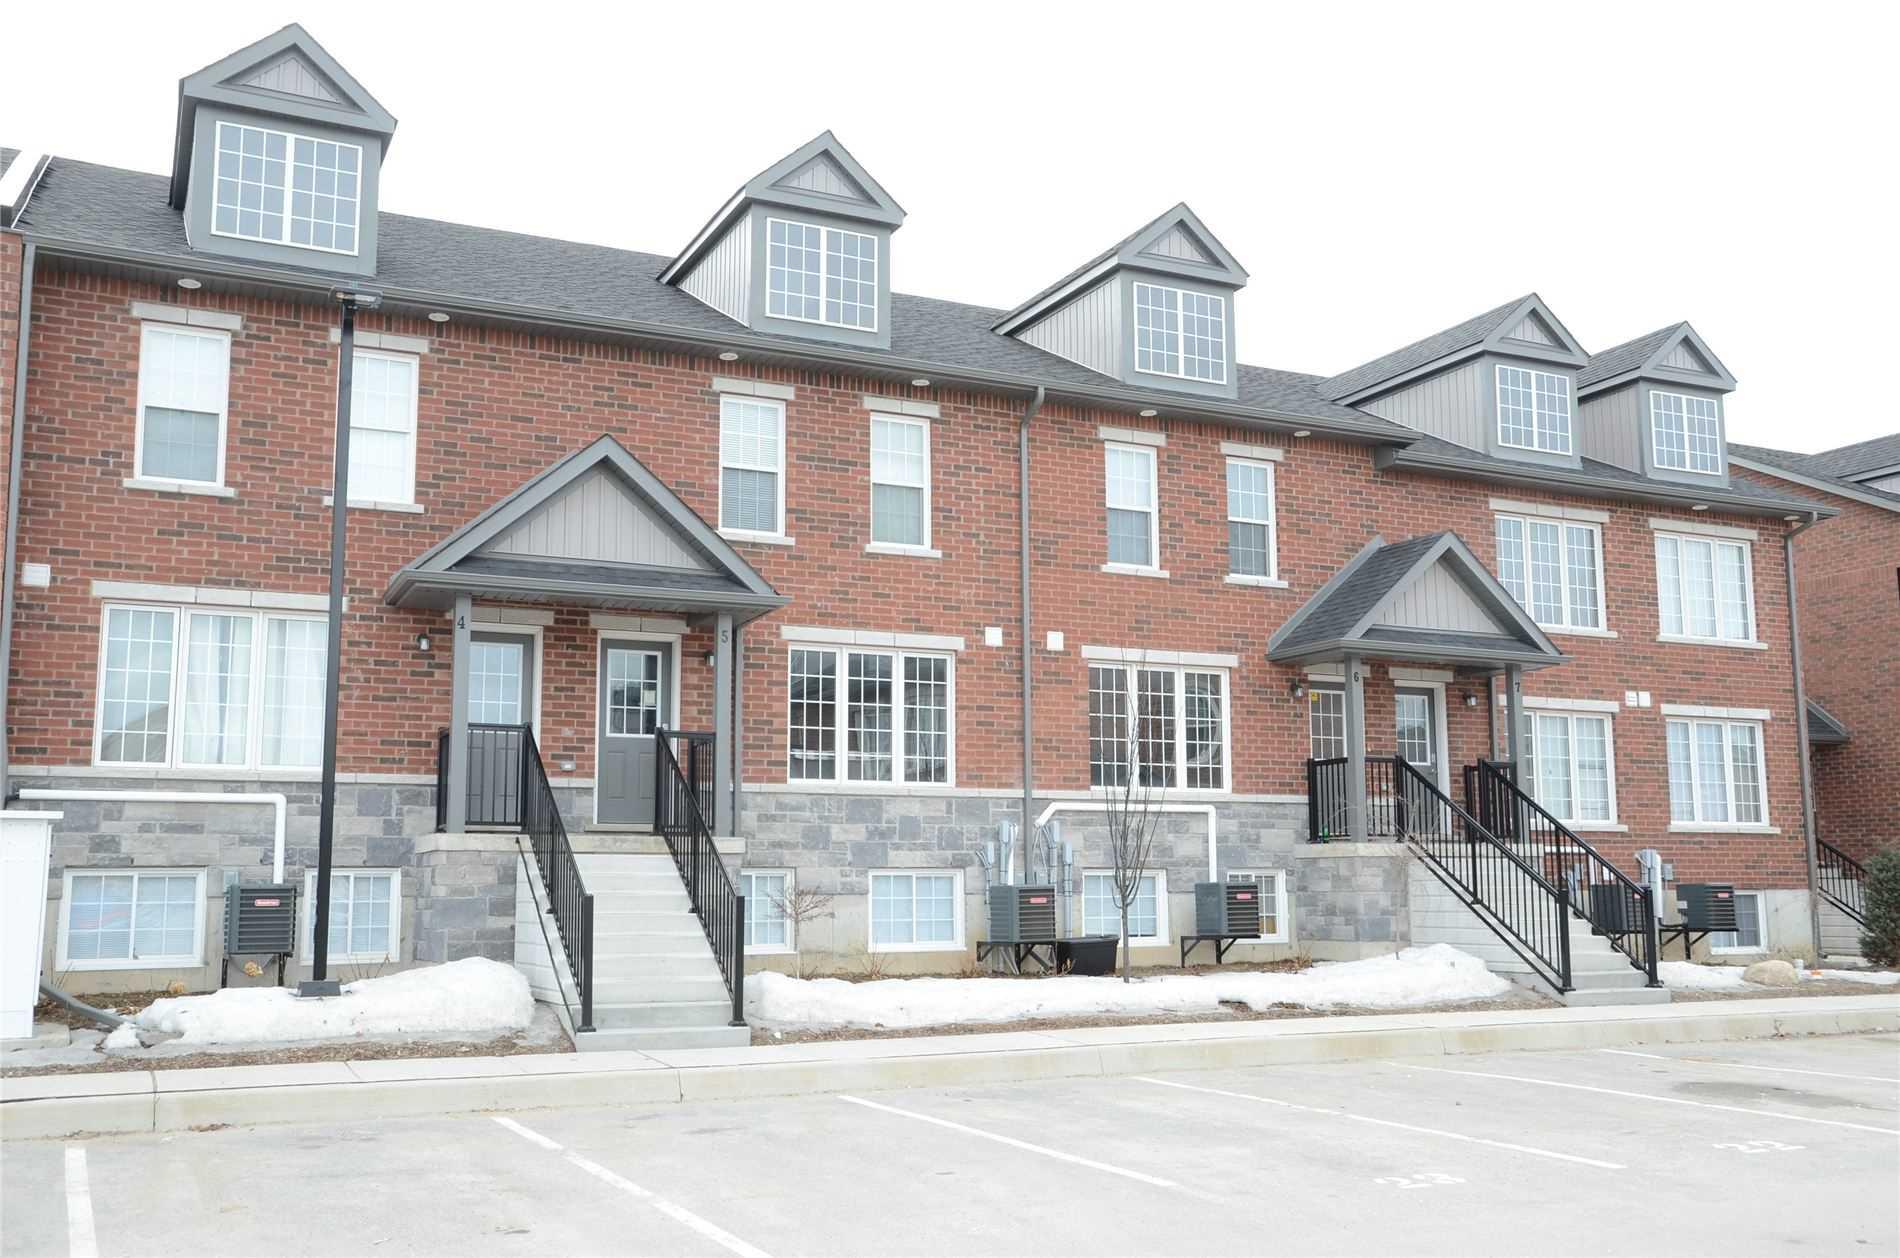 Condo Townhouse For Sale In Barrie , 4 Bedrooms Bedrooms, ,4 BathroomsBathrooms,Condo Townhouse,For Sale,7,Penetanguishene